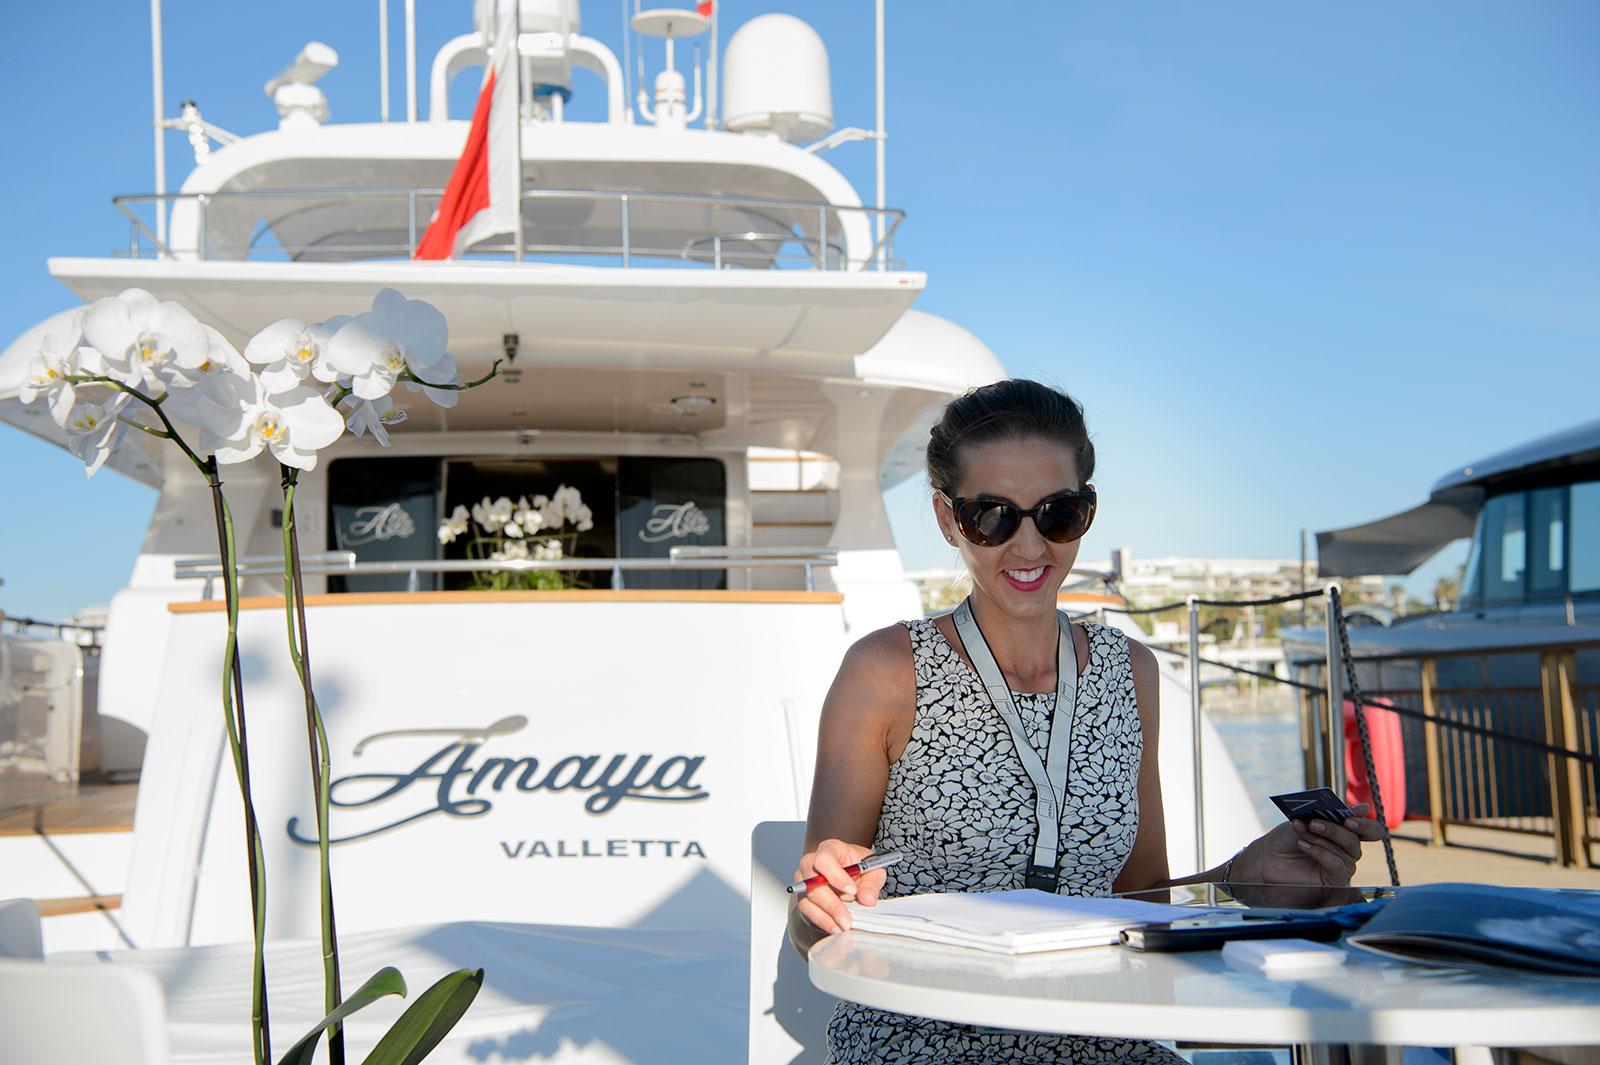 https://www.amayayacht.com/wp-content/uploads/2019/01/amaya-cannes-yacht.jpg